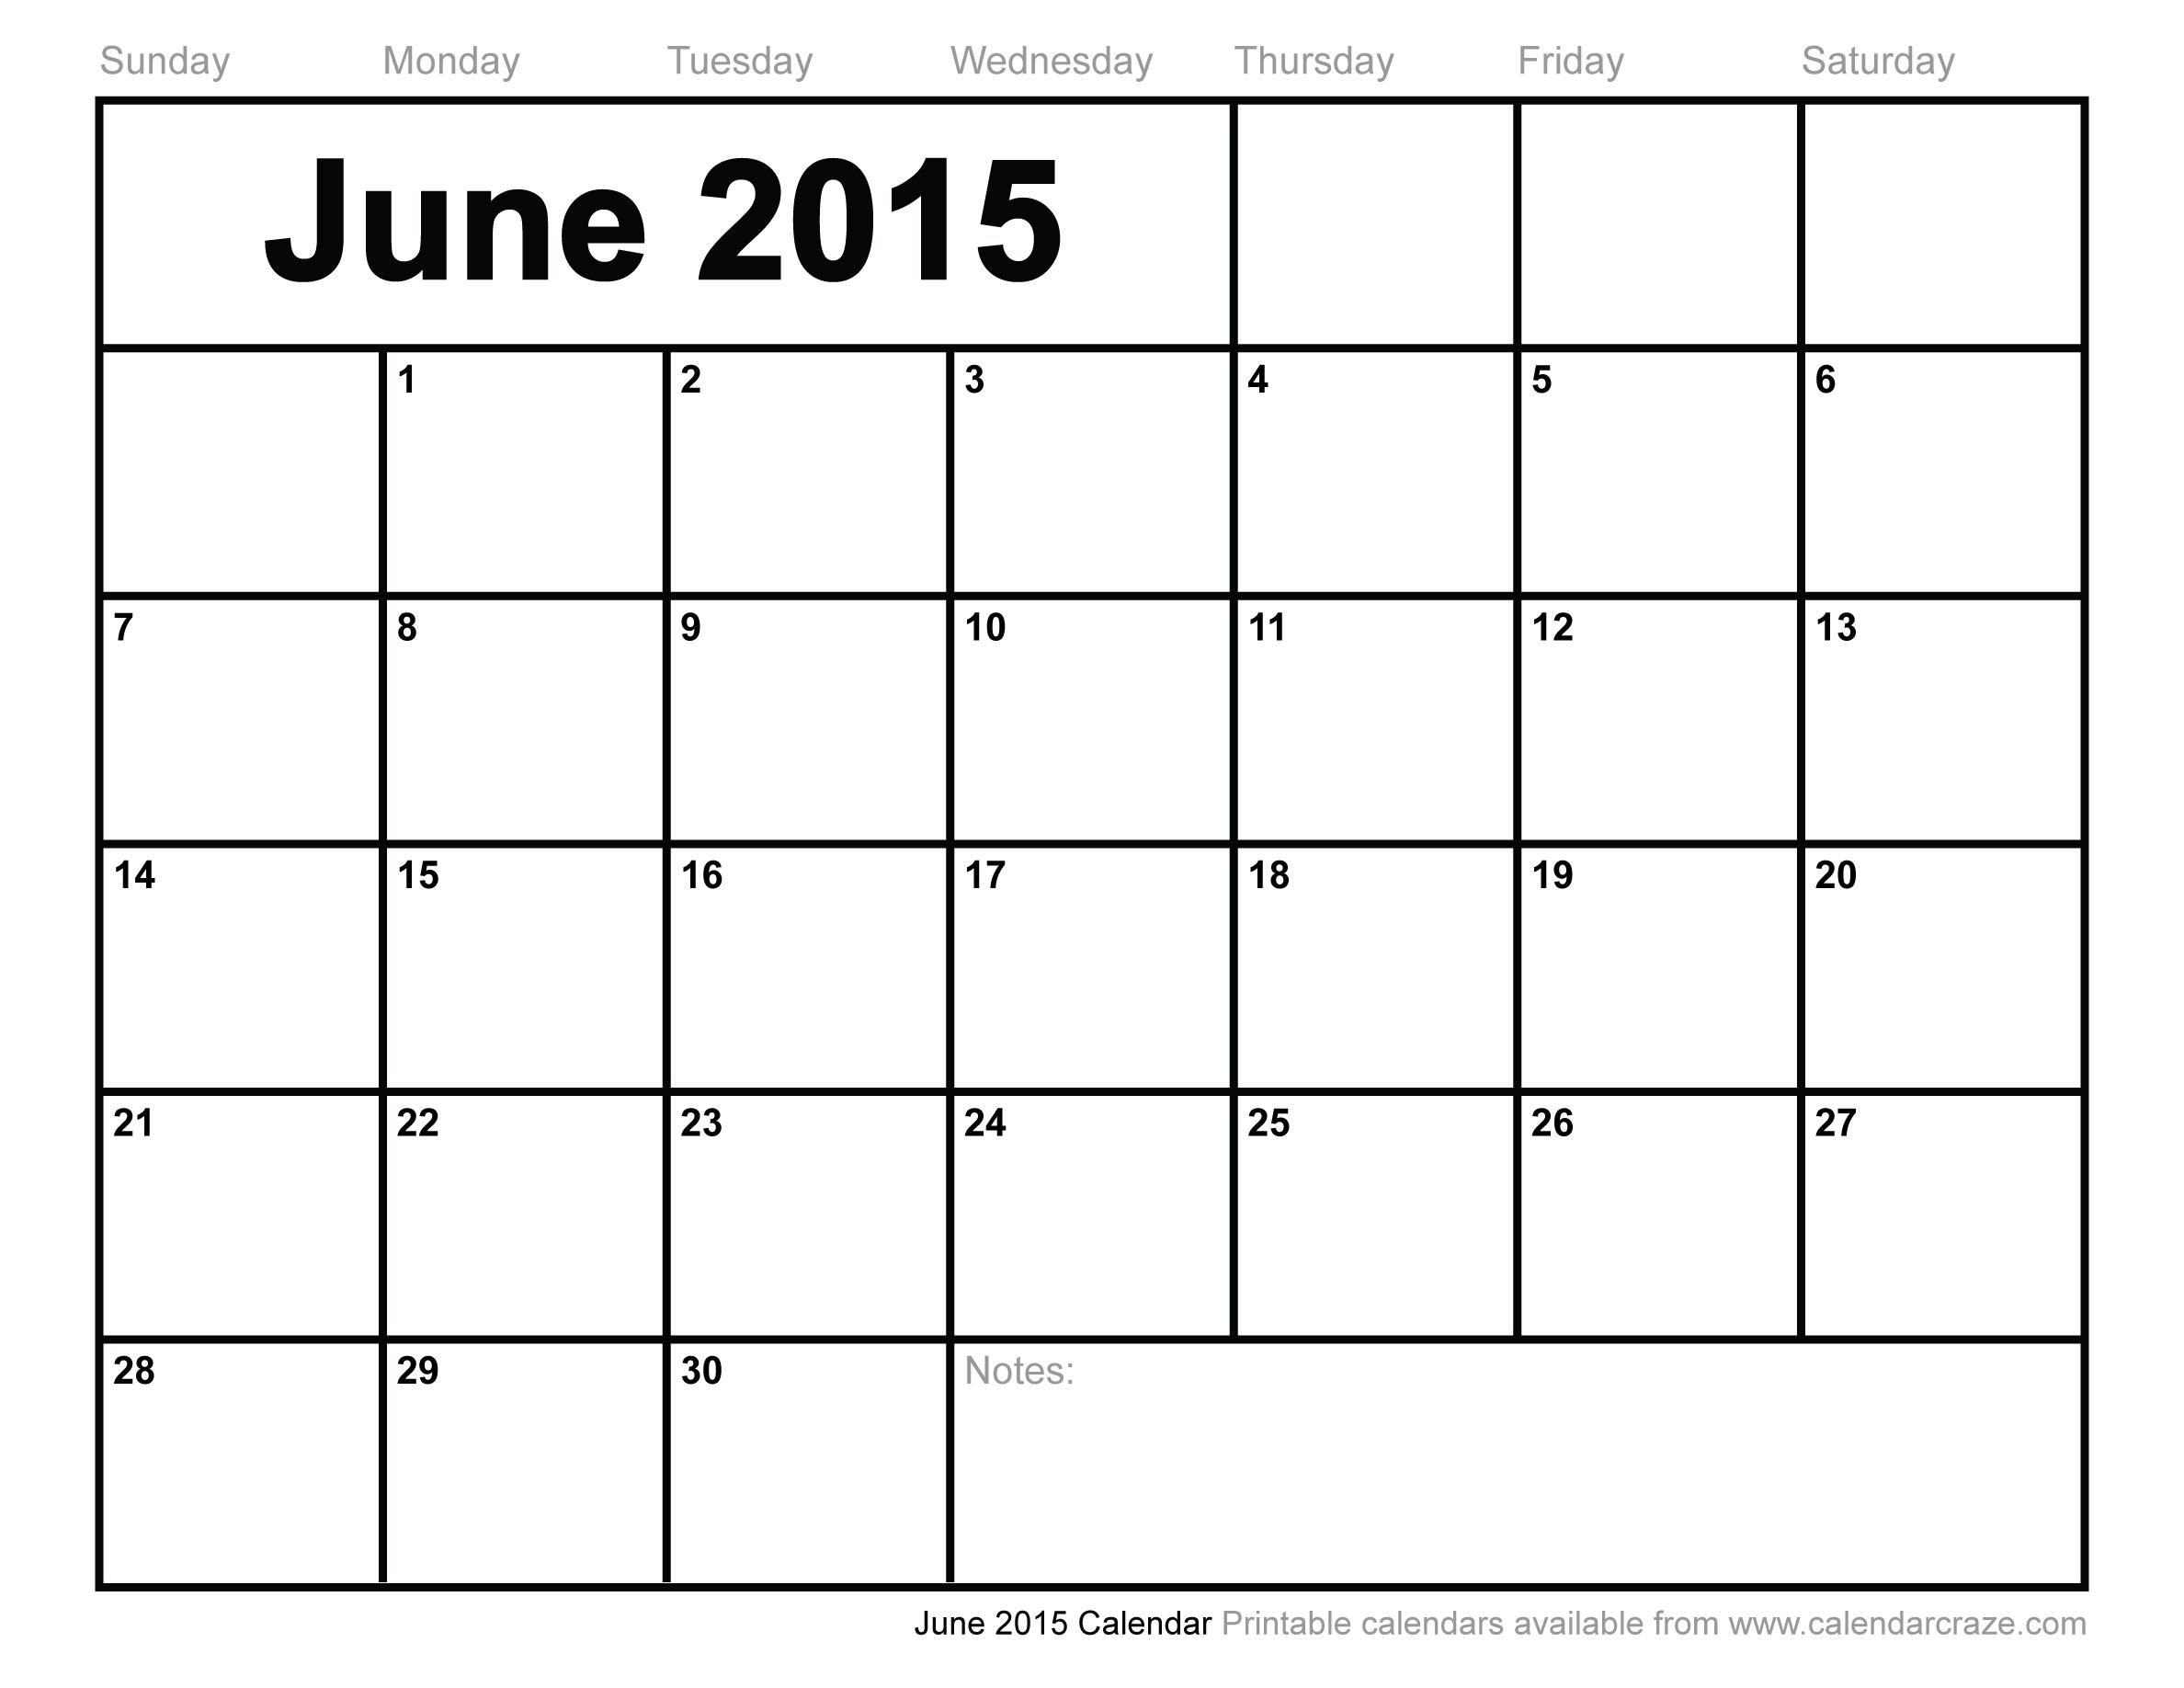 June 2015 Calendar Free Xlarge Images Pomorenian Pinterest